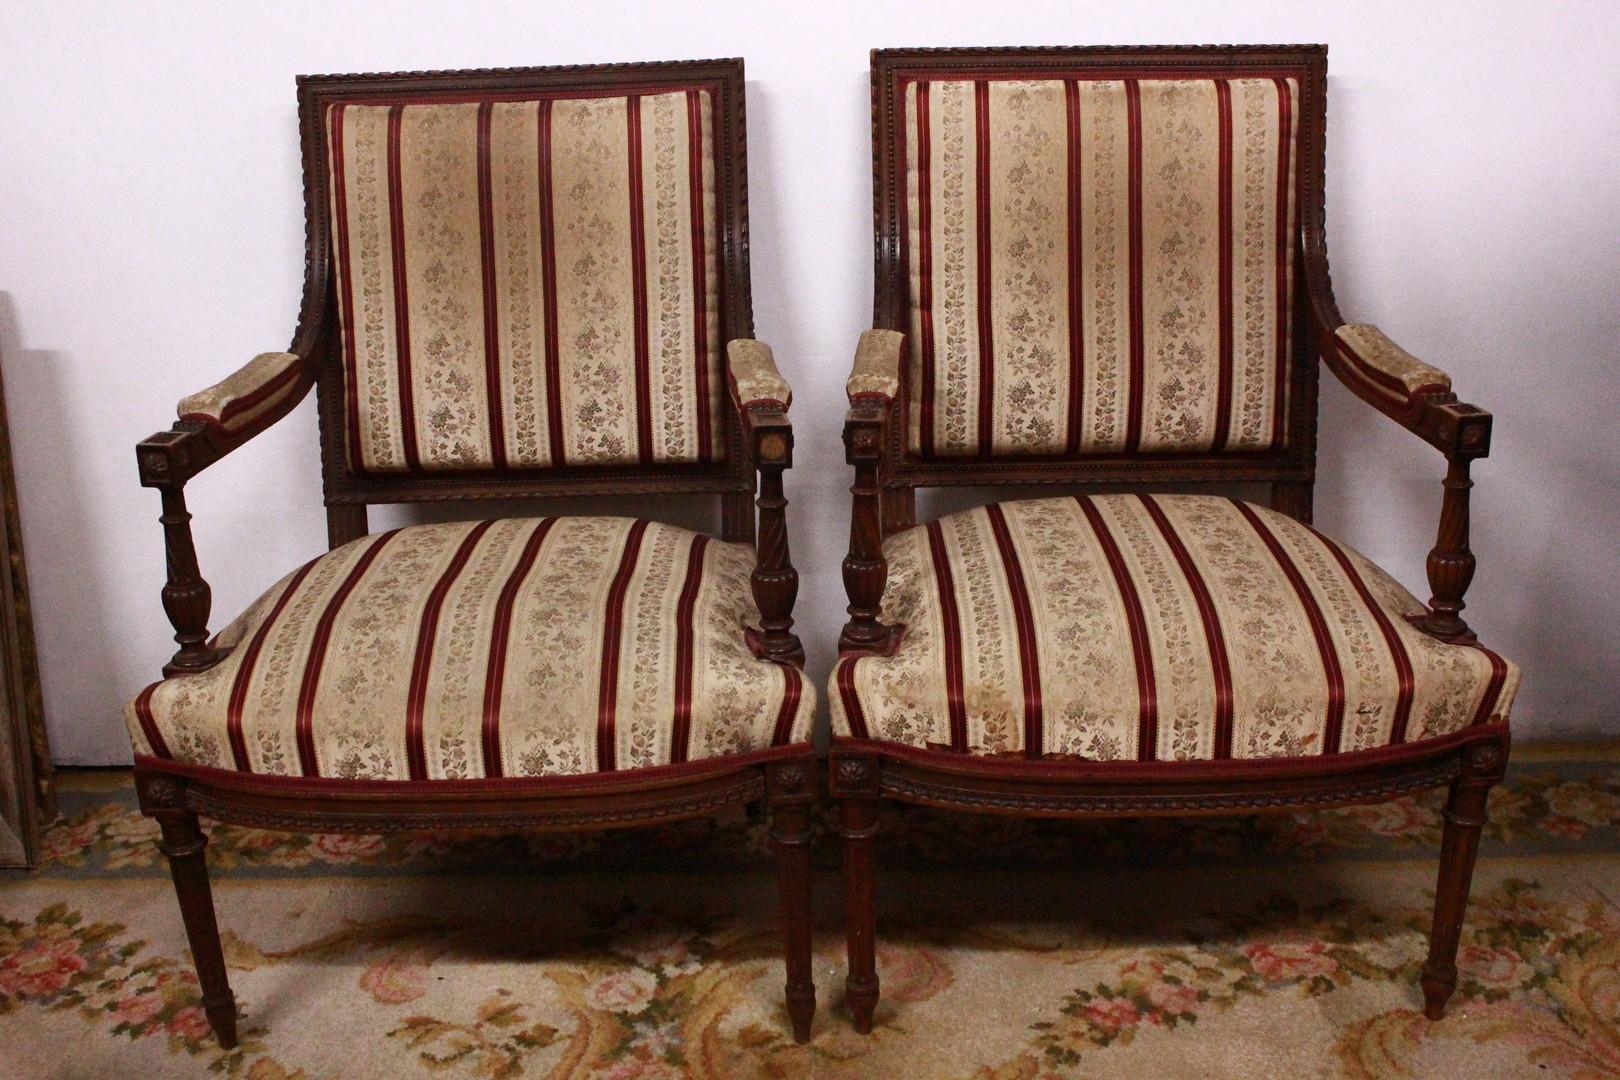 Sedie 800 Francese : Coppia di sedie francesi del xix secolo u divani originali